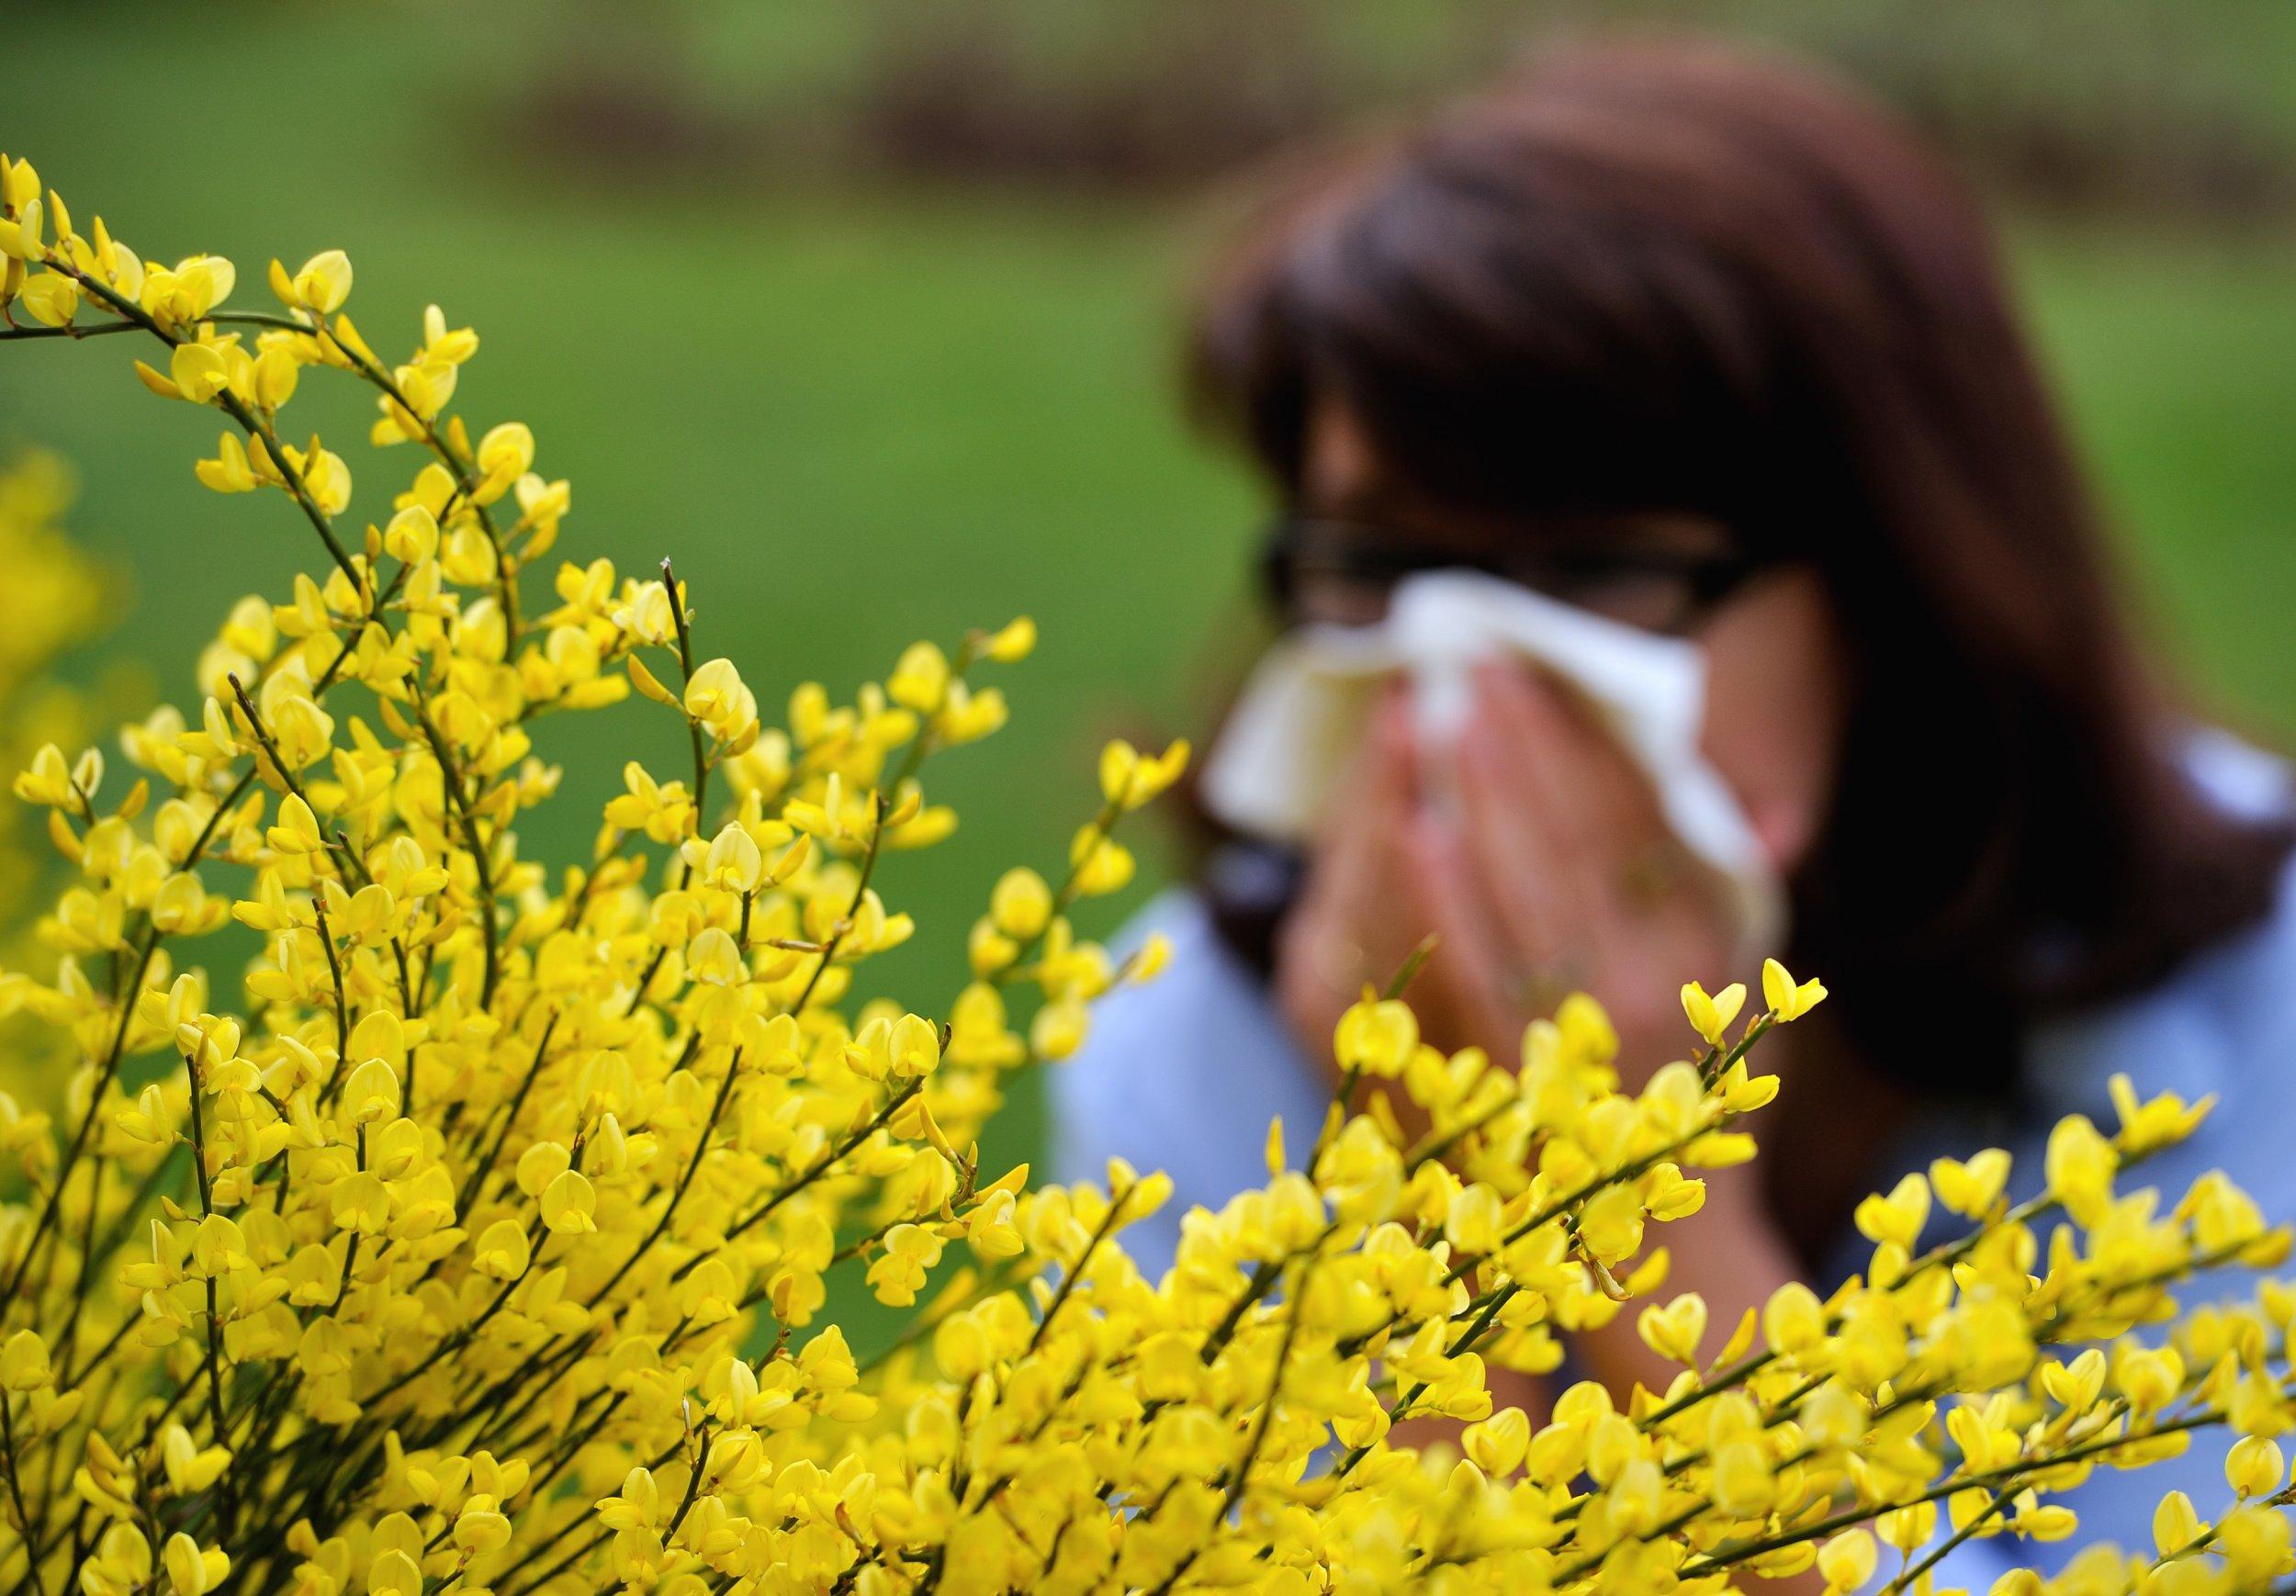 allergy season flowers and sneezing